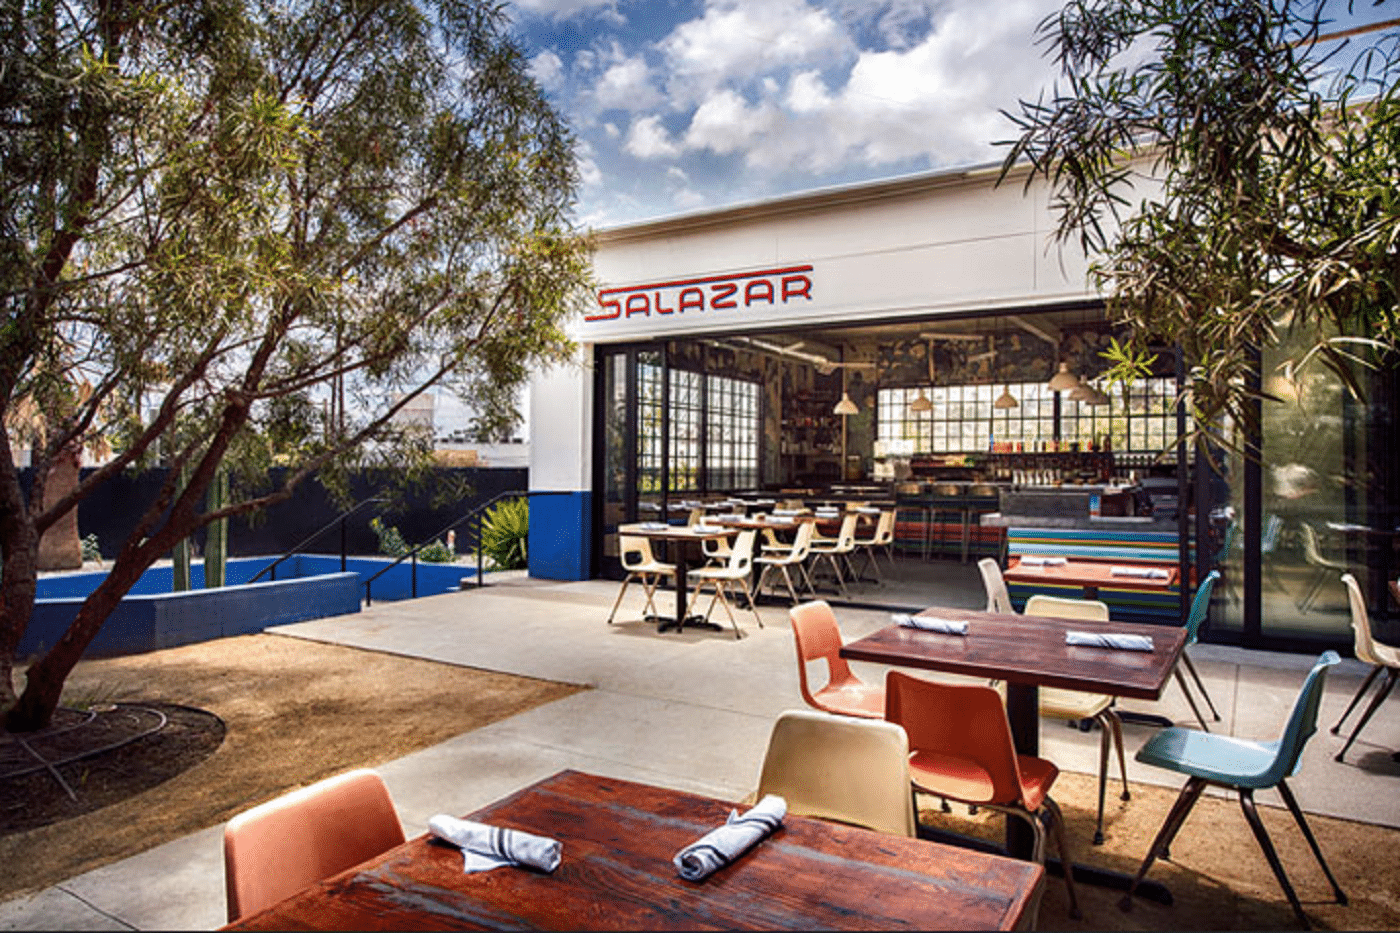 Salazar Mexican Restaurant, 2490 Fletcher Dr, Los Angeles, CA 90039 was cited for refilling Liquor Bottles